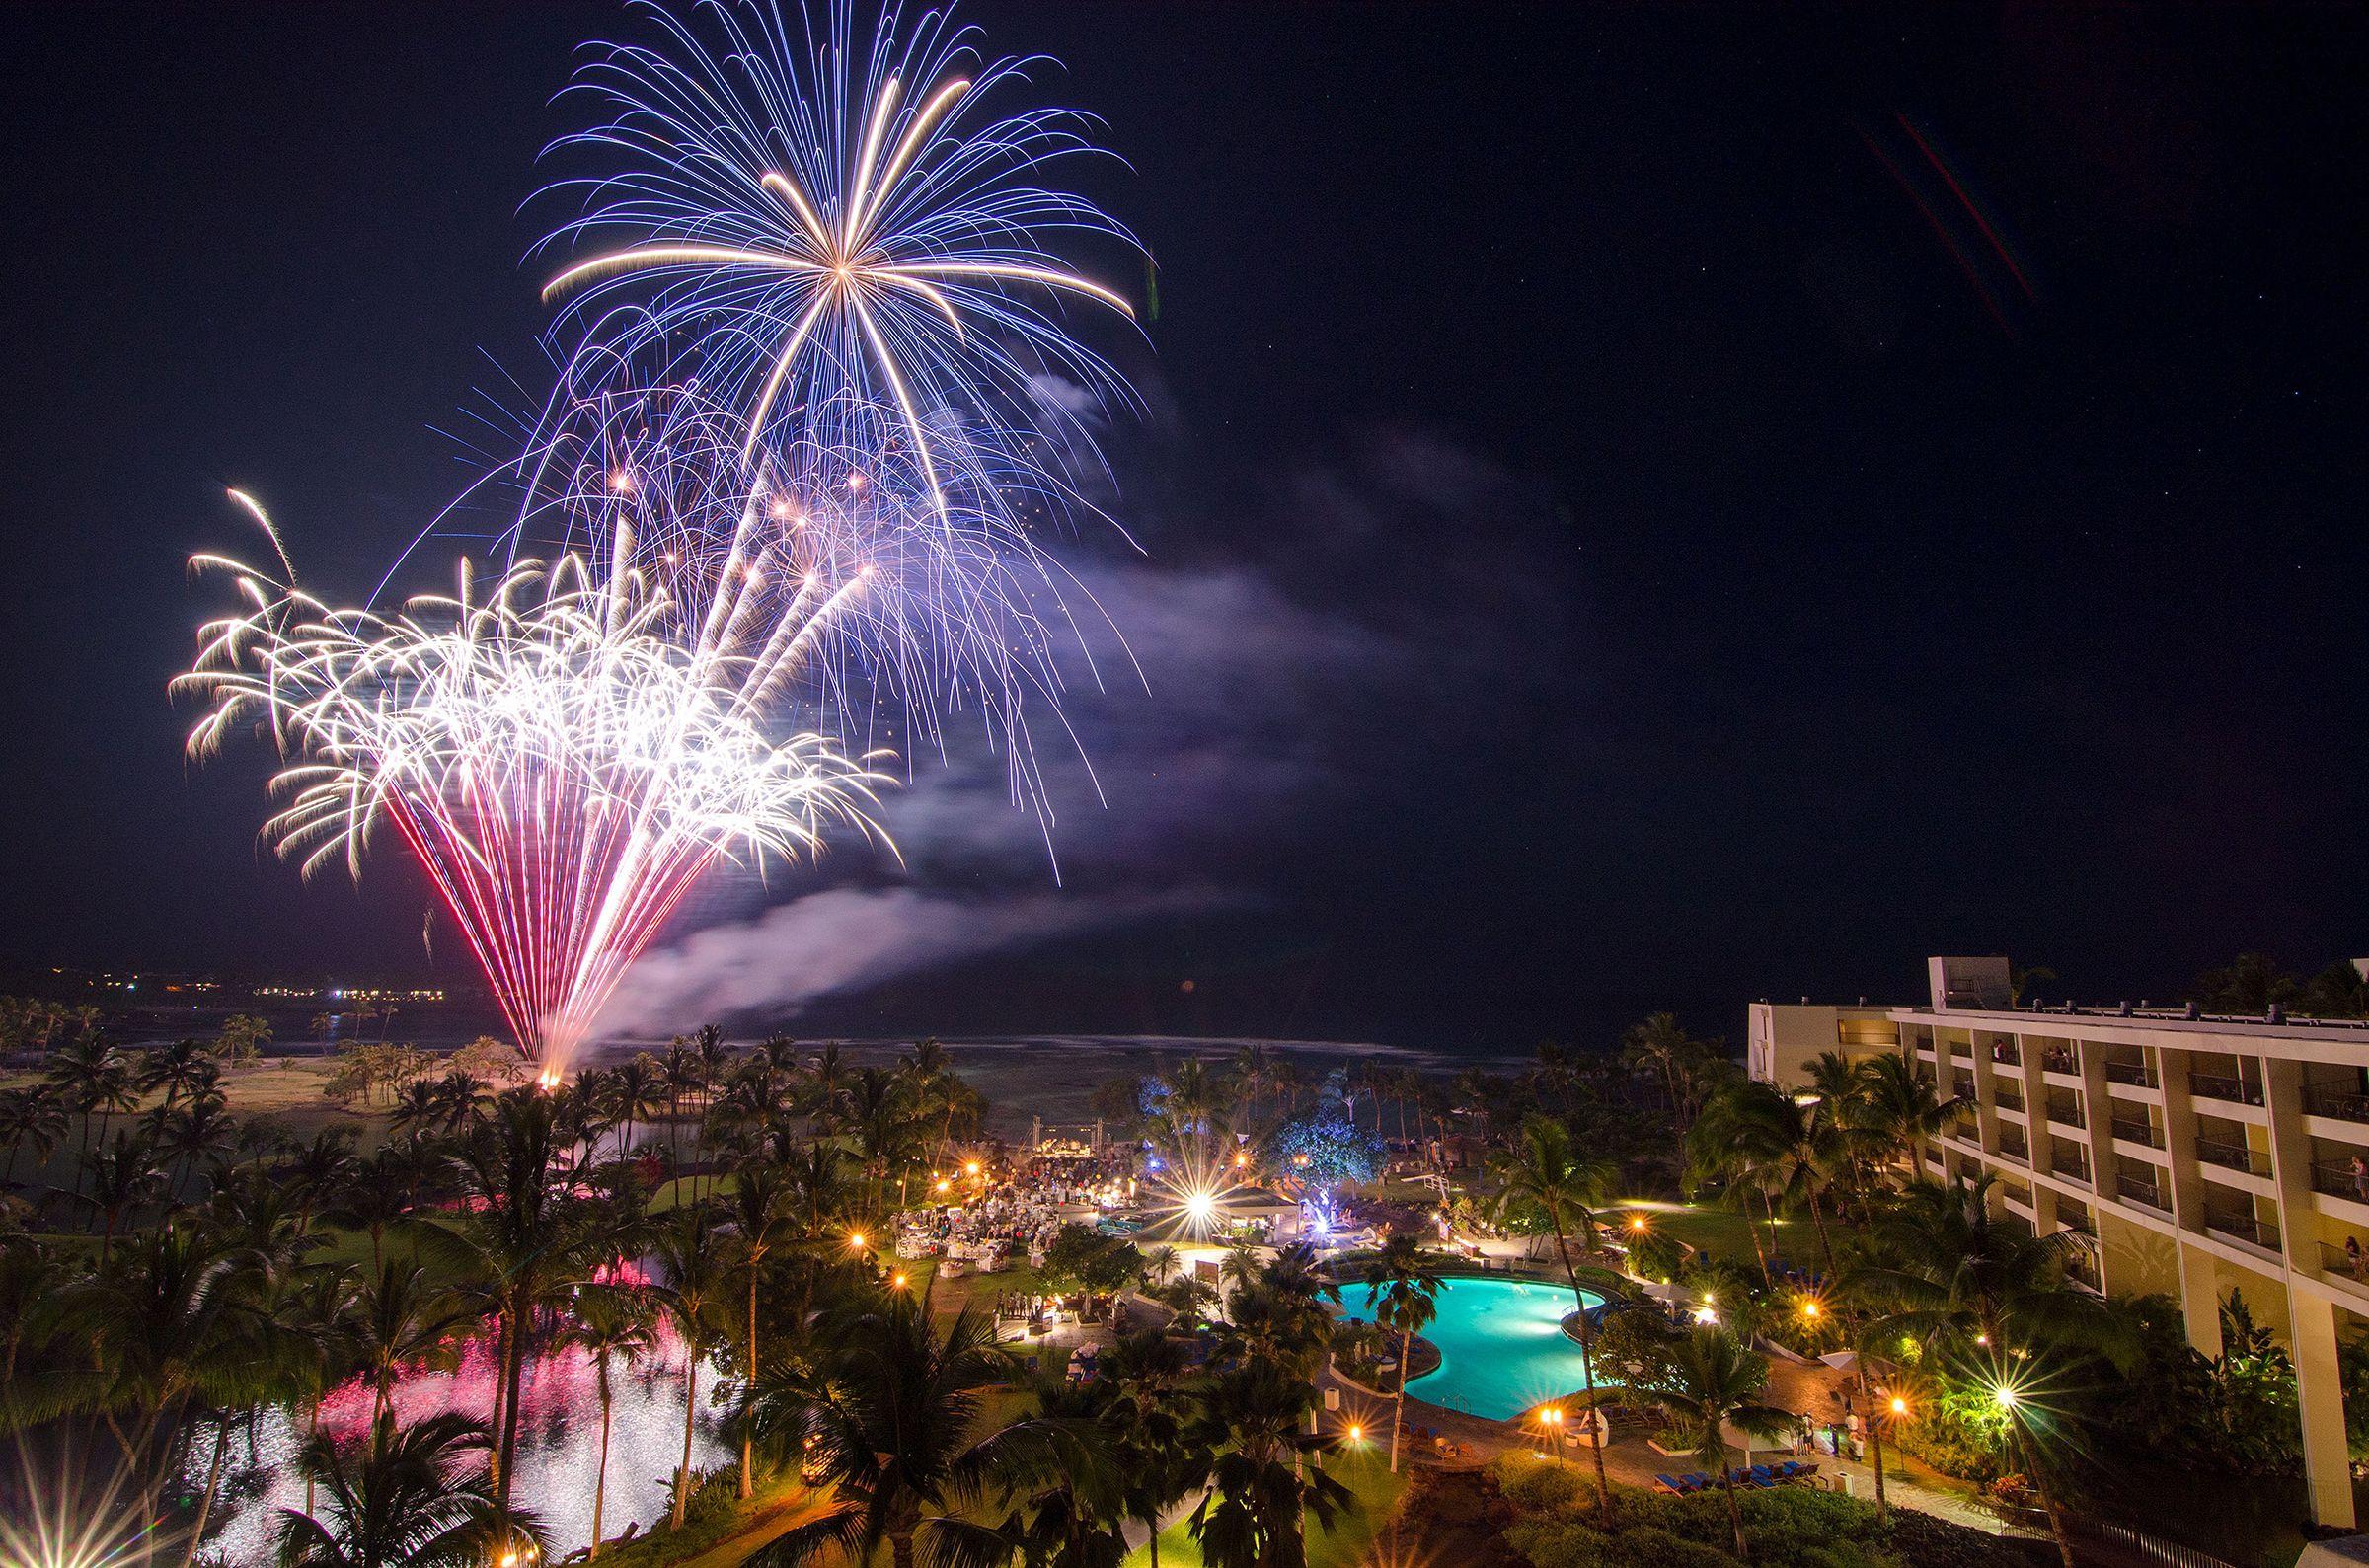 Hawaii Big Island New Year's Eve Fireworks & Celebrations